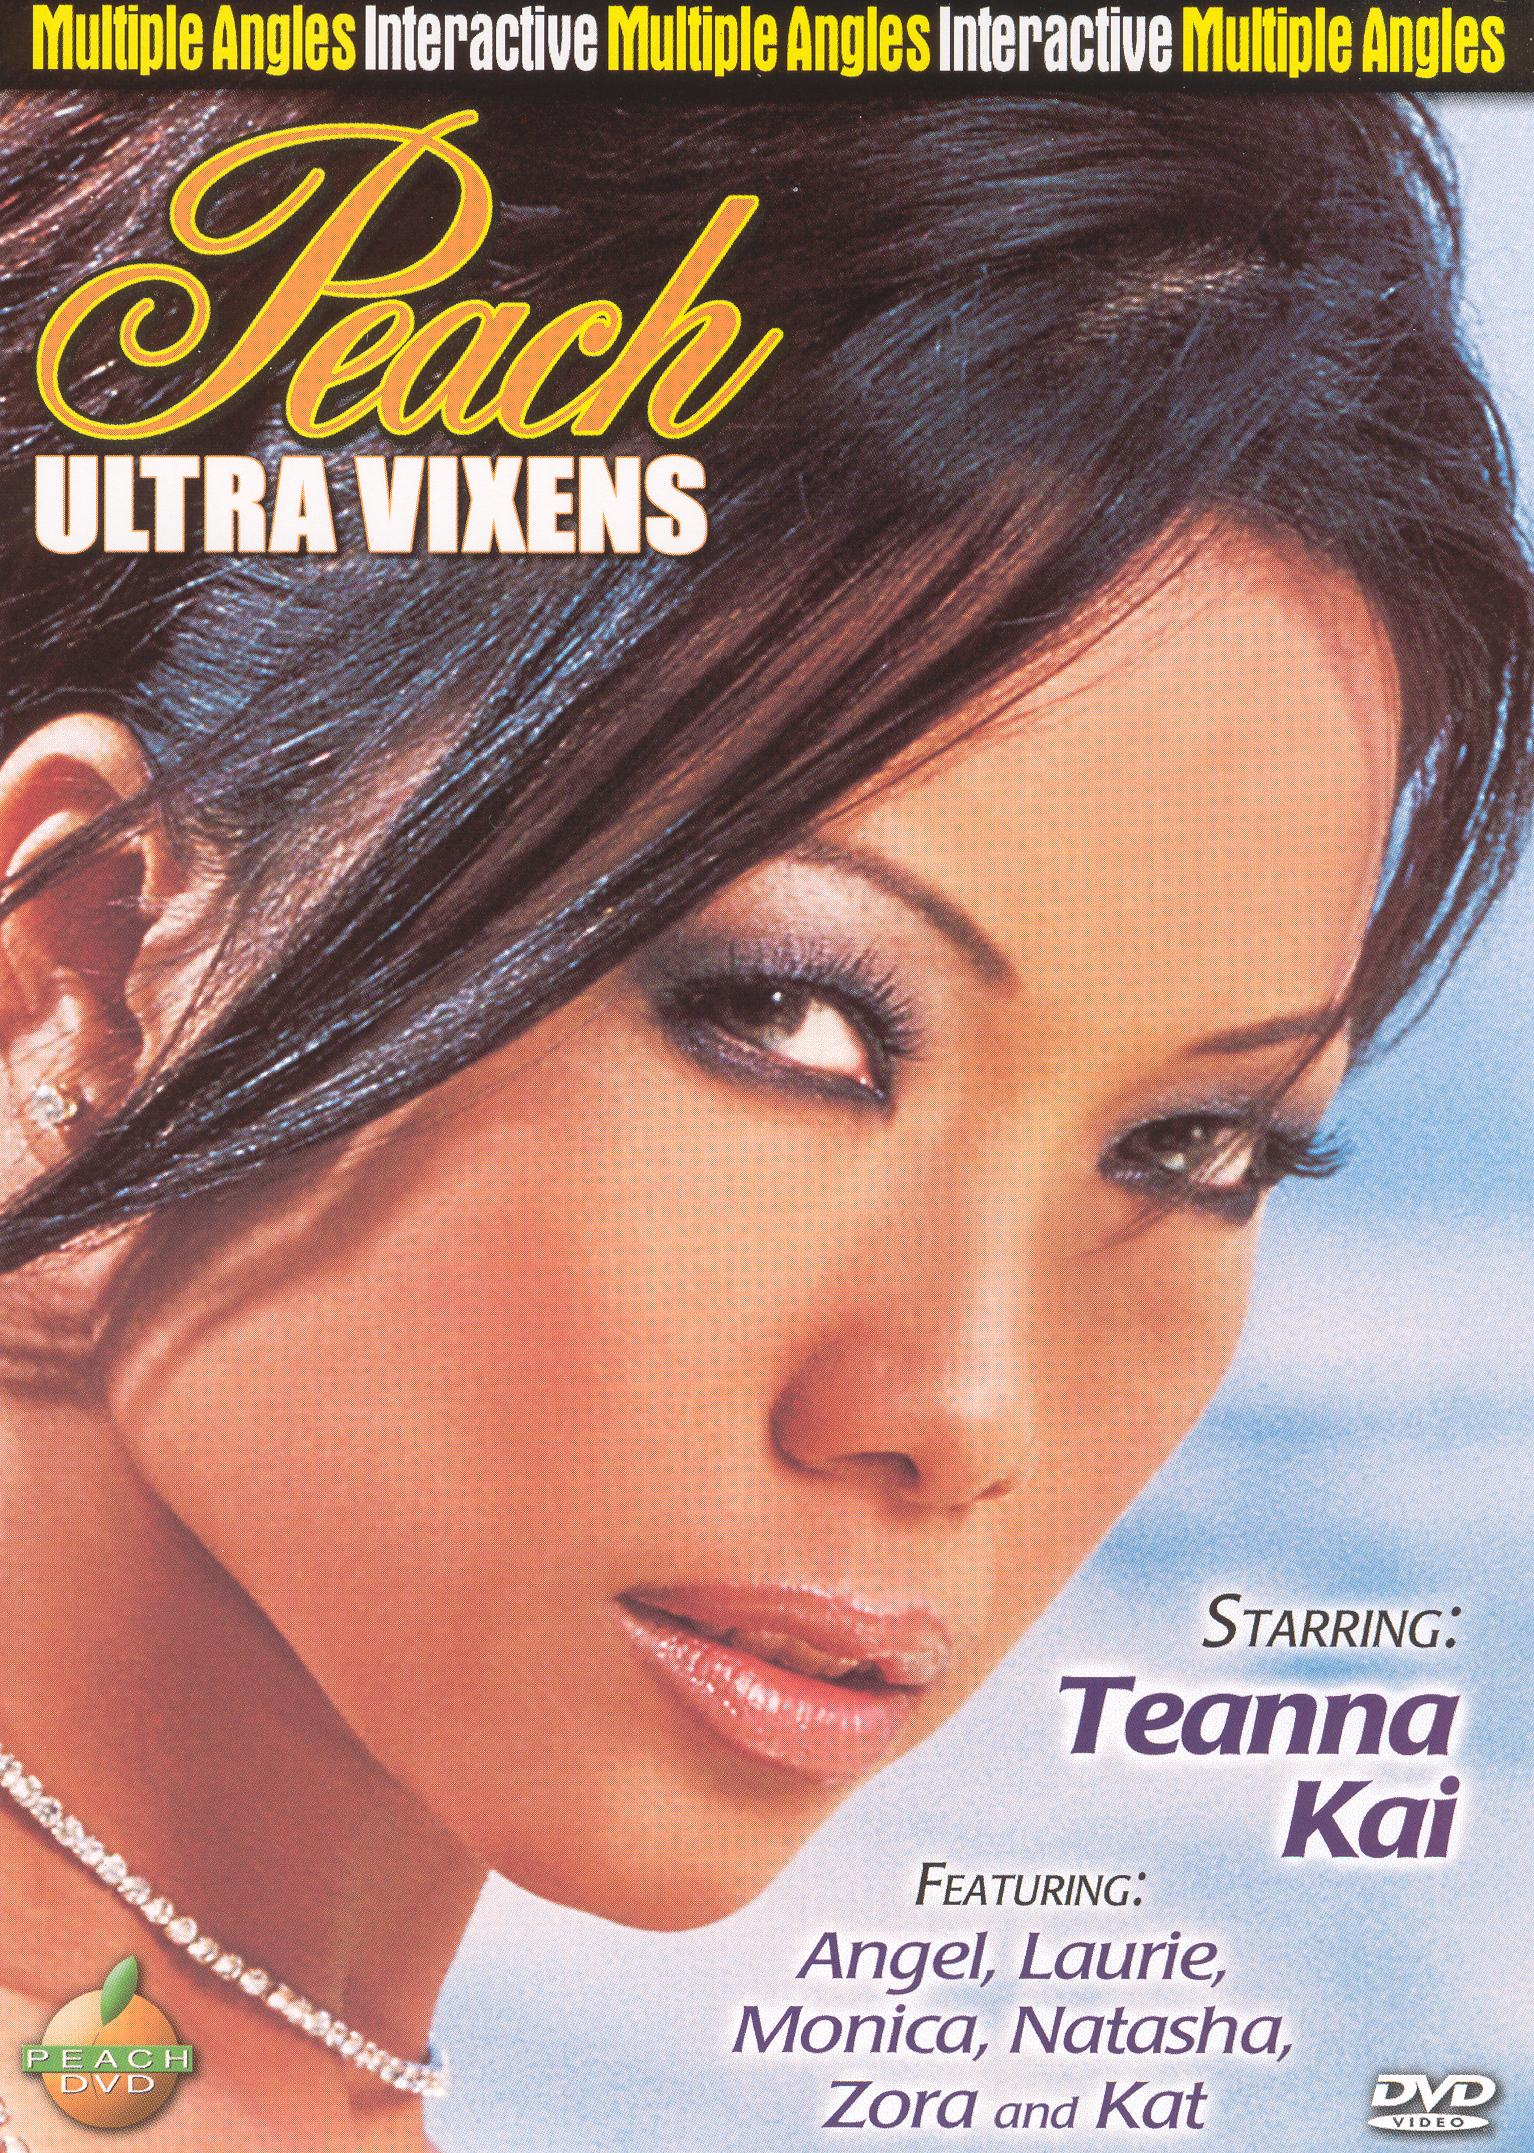 Peach Ultra Vixens: Teanna Kai